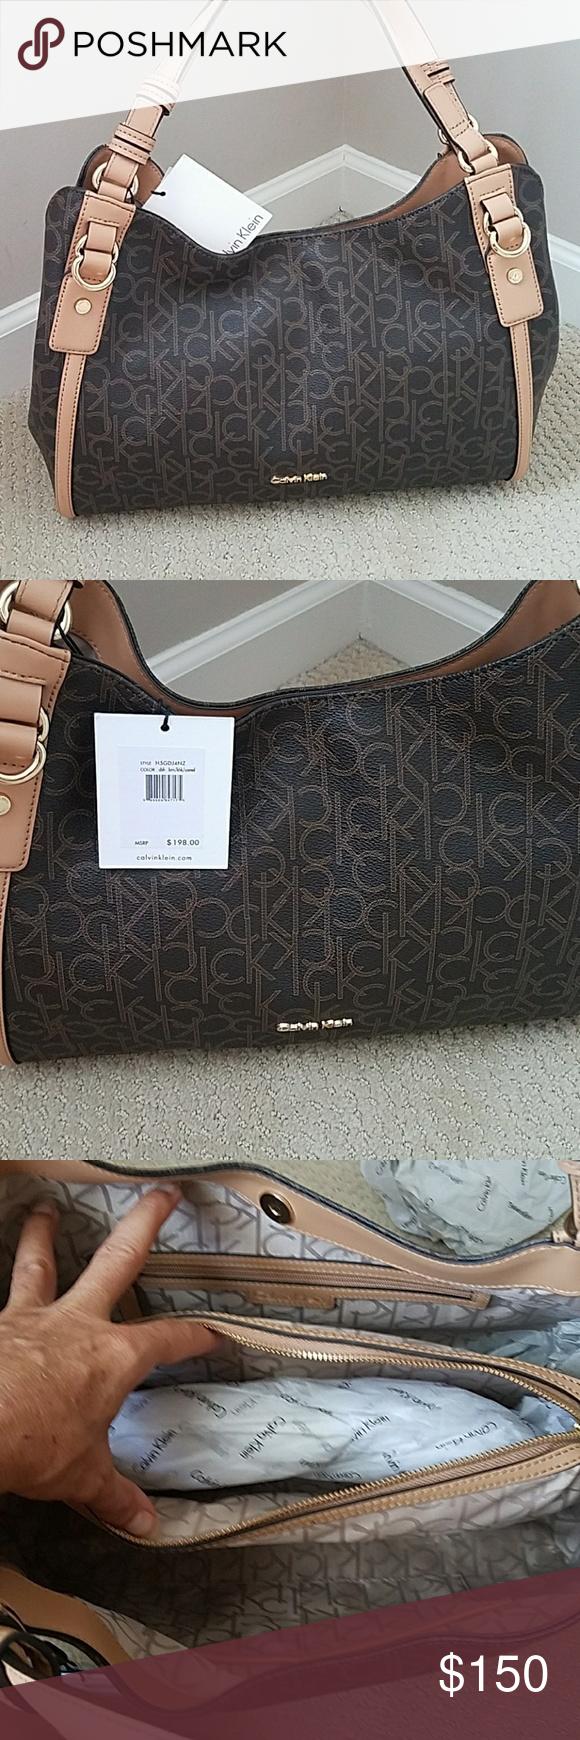 ef111b0f2e CK Purse👜 Final👇 Beautiful brand new satchel handbag monogram purse! Can  wear over shoulder or on arm. 13